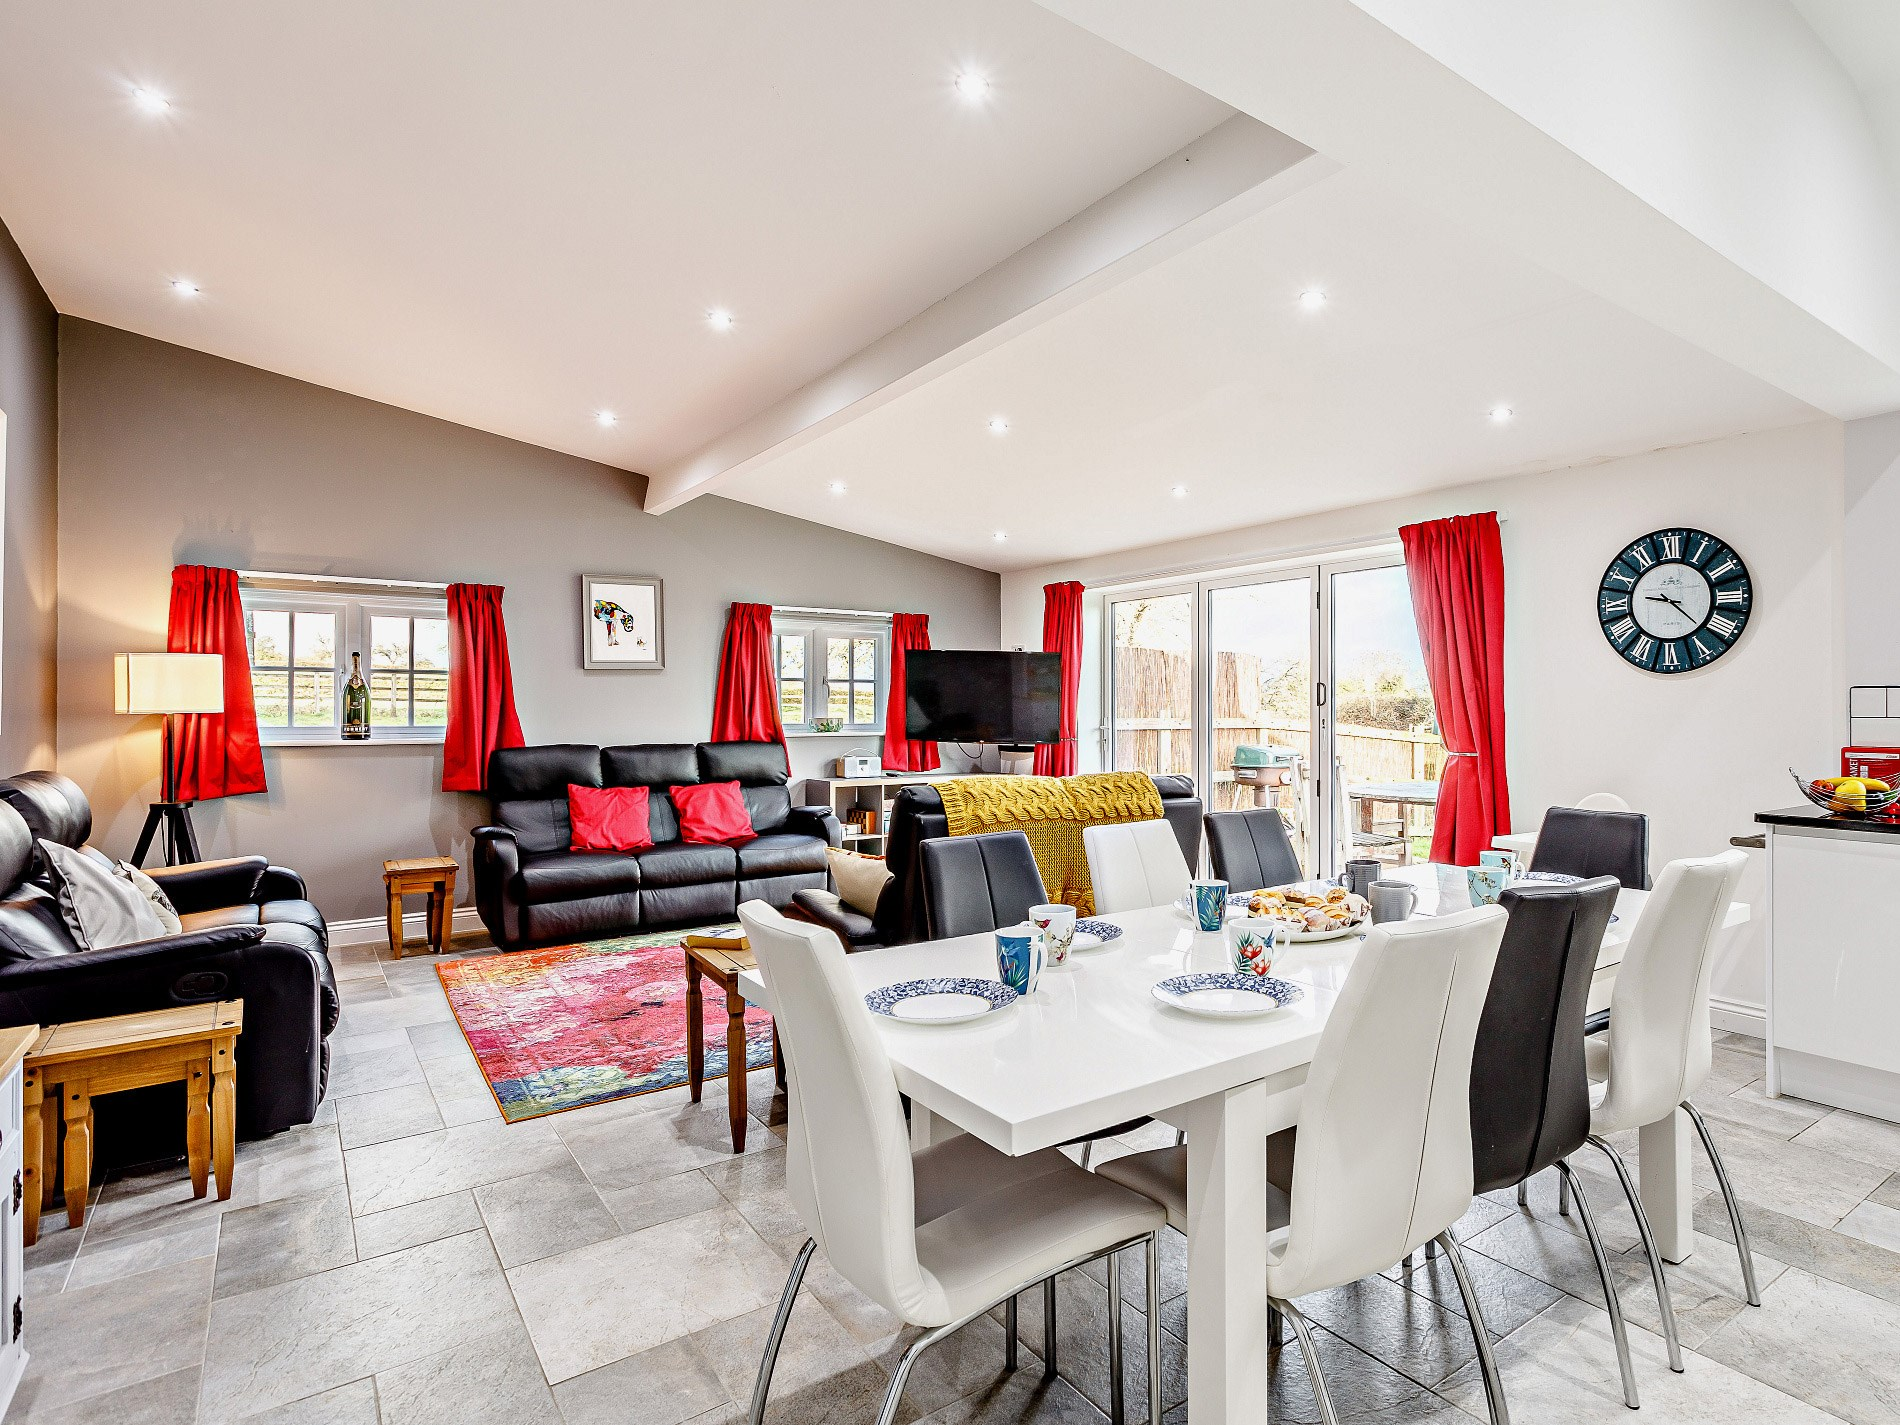 4 Bedroom Cottage in Wedmore, Dorset and Somerset